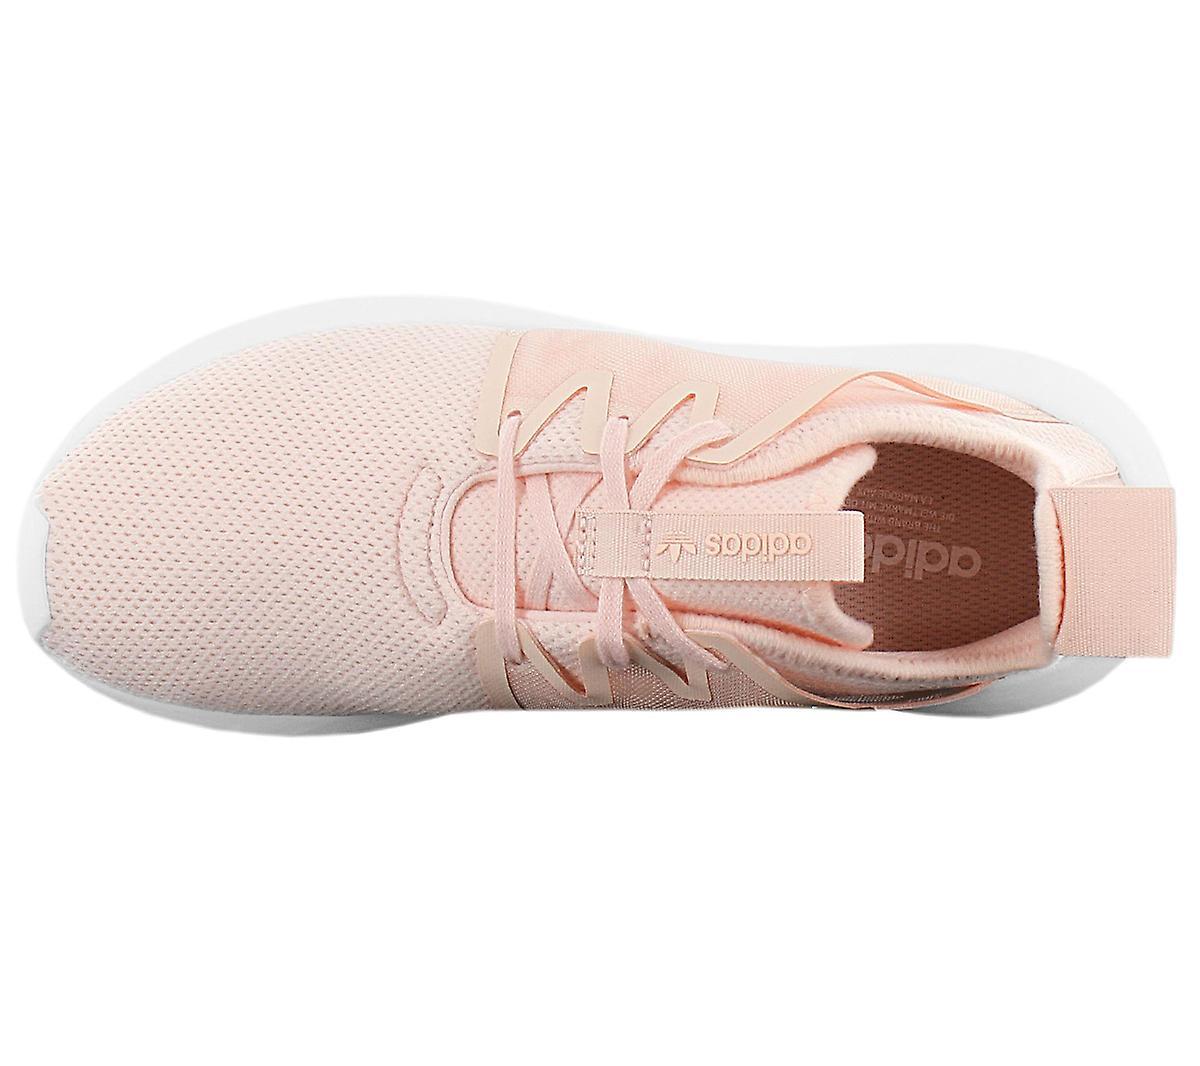 adidas Tubular Viral 2 W BY2122 Damen Schuhe Pink Sneakers Sportschuhe